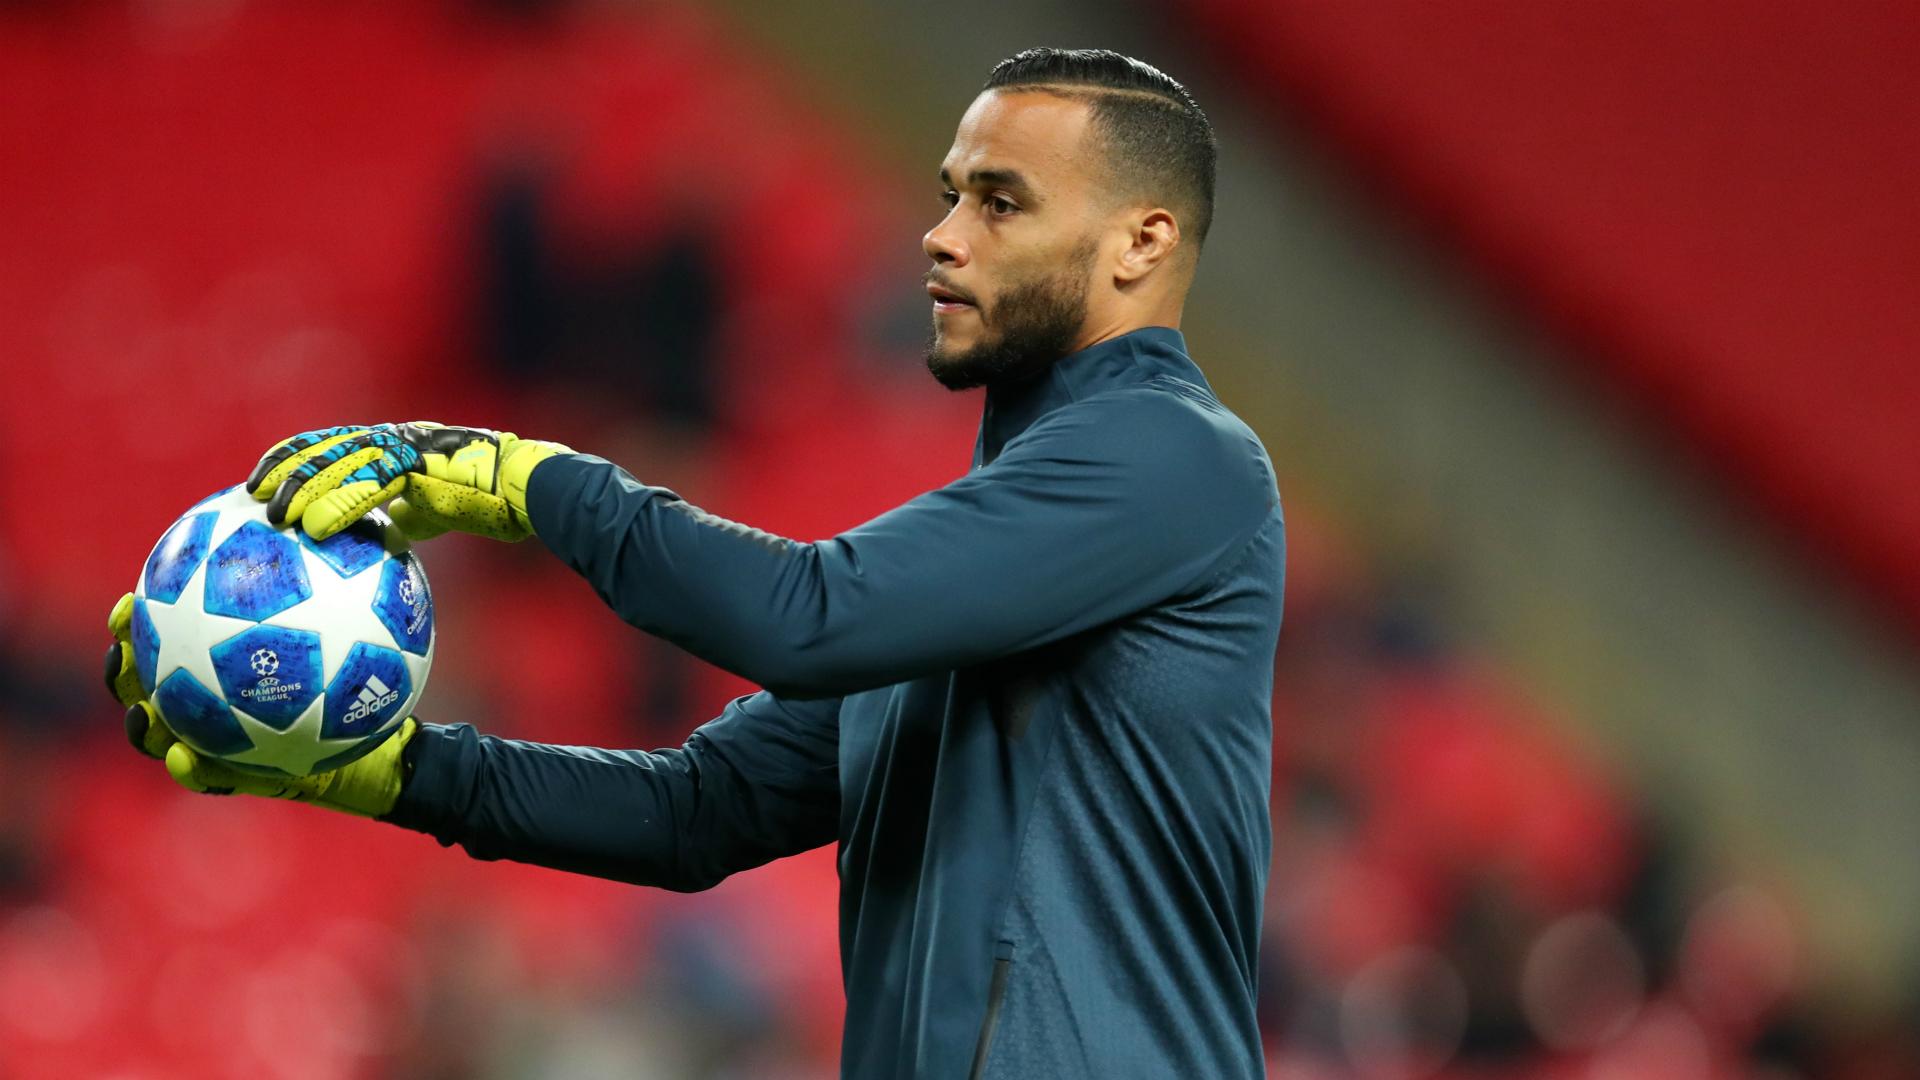 Tottenham re-sign Vorm as cover for injured Lloris